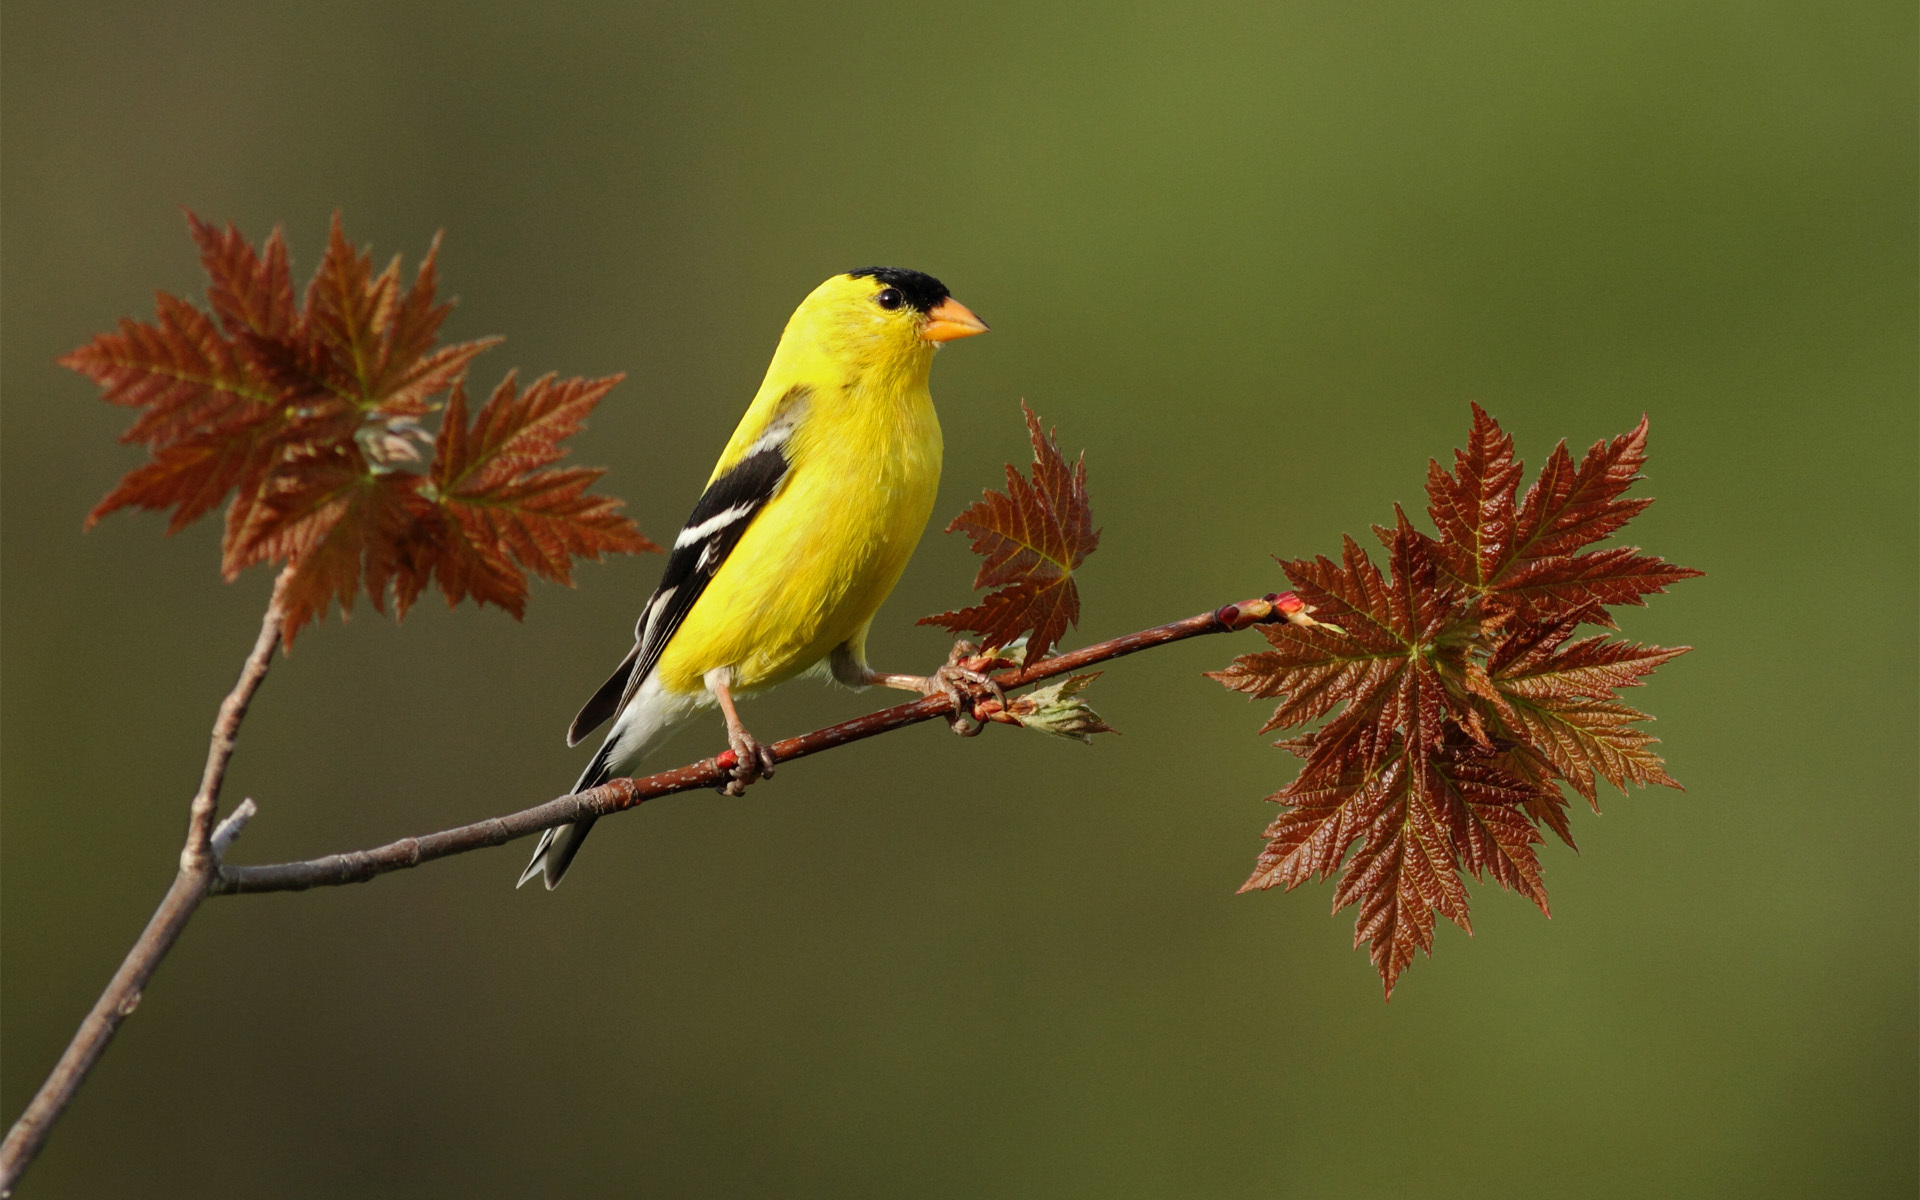 Fantastic Yellow Bird Wallpaper